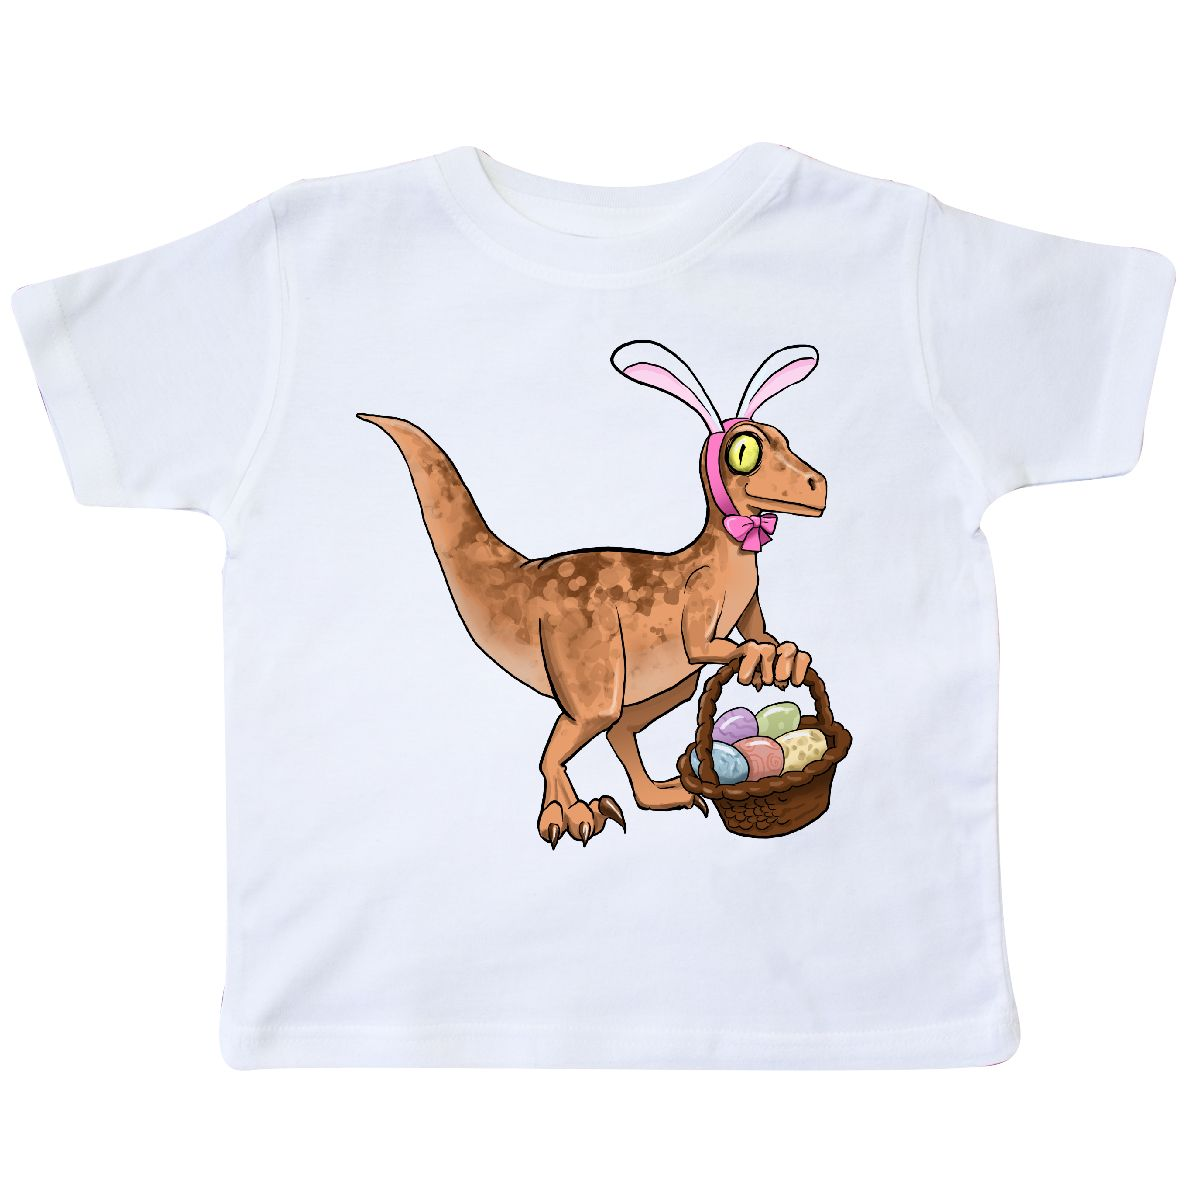 90e5ec0e4 Inktastic Easter Velociraptor With Bunny Ears Toddler T-Shirt Kids ...